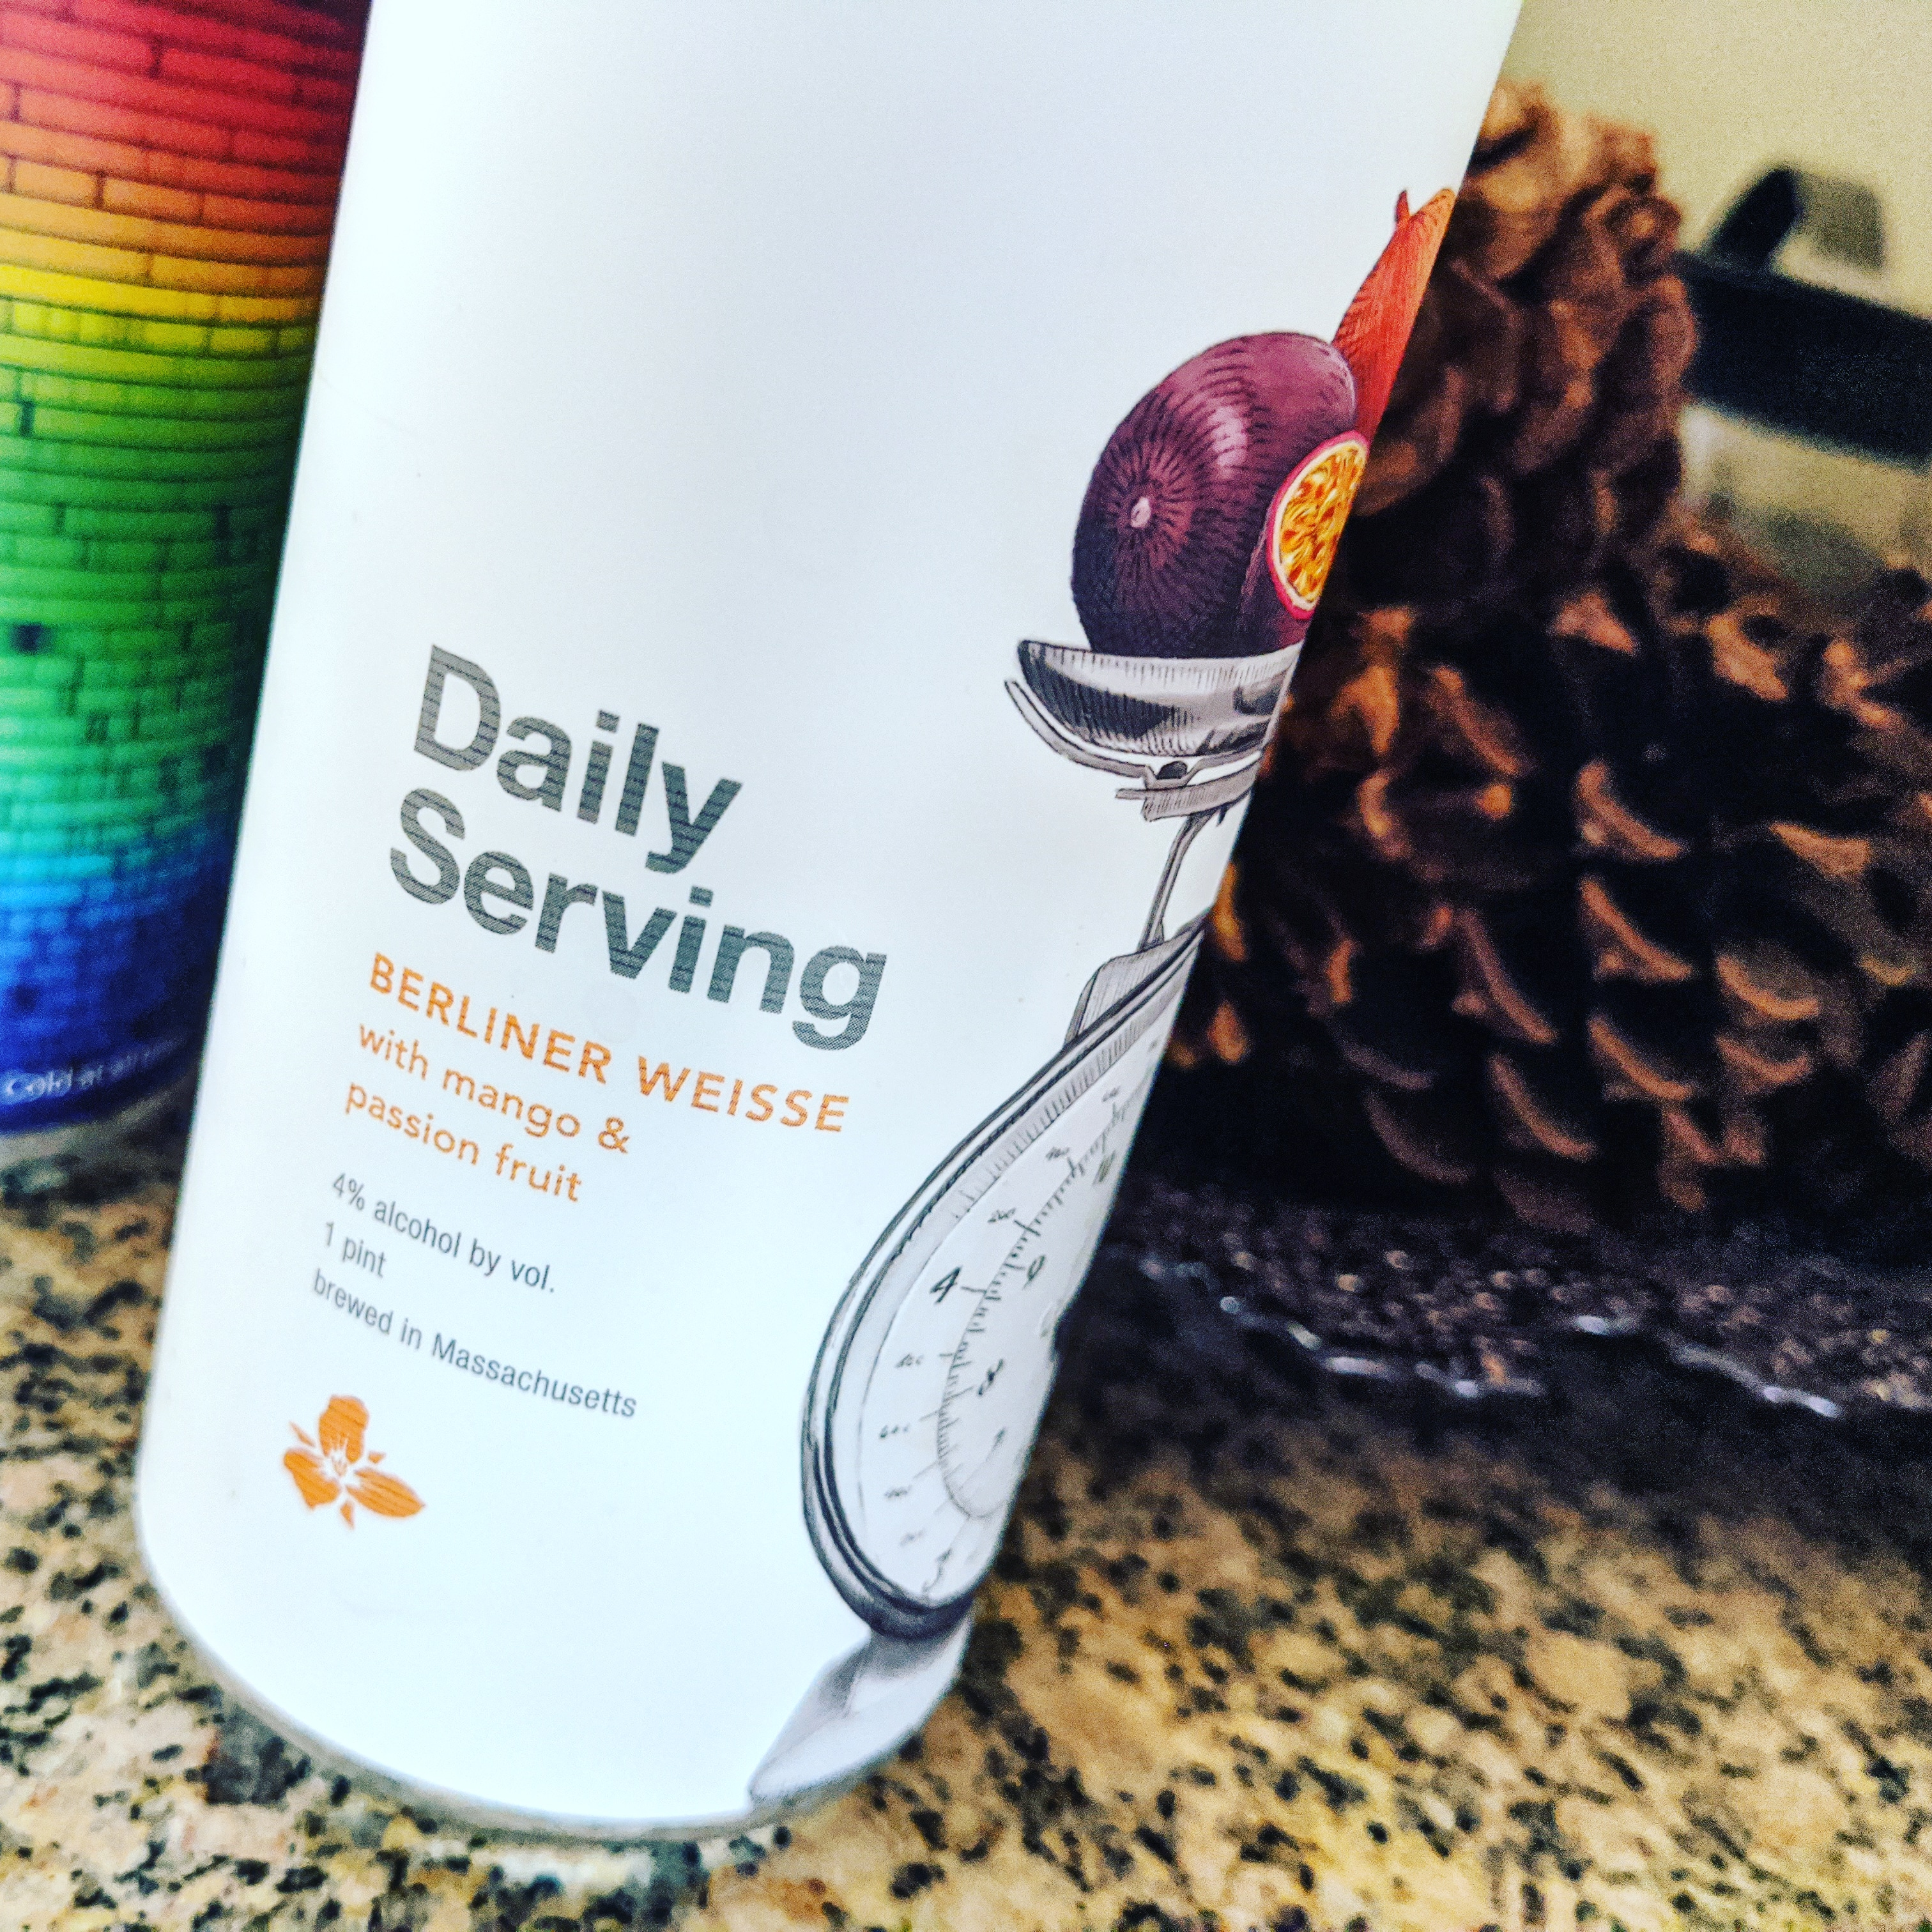 Trillium Daily Serving: Mango & Passion Fruit. [Обзор пива].